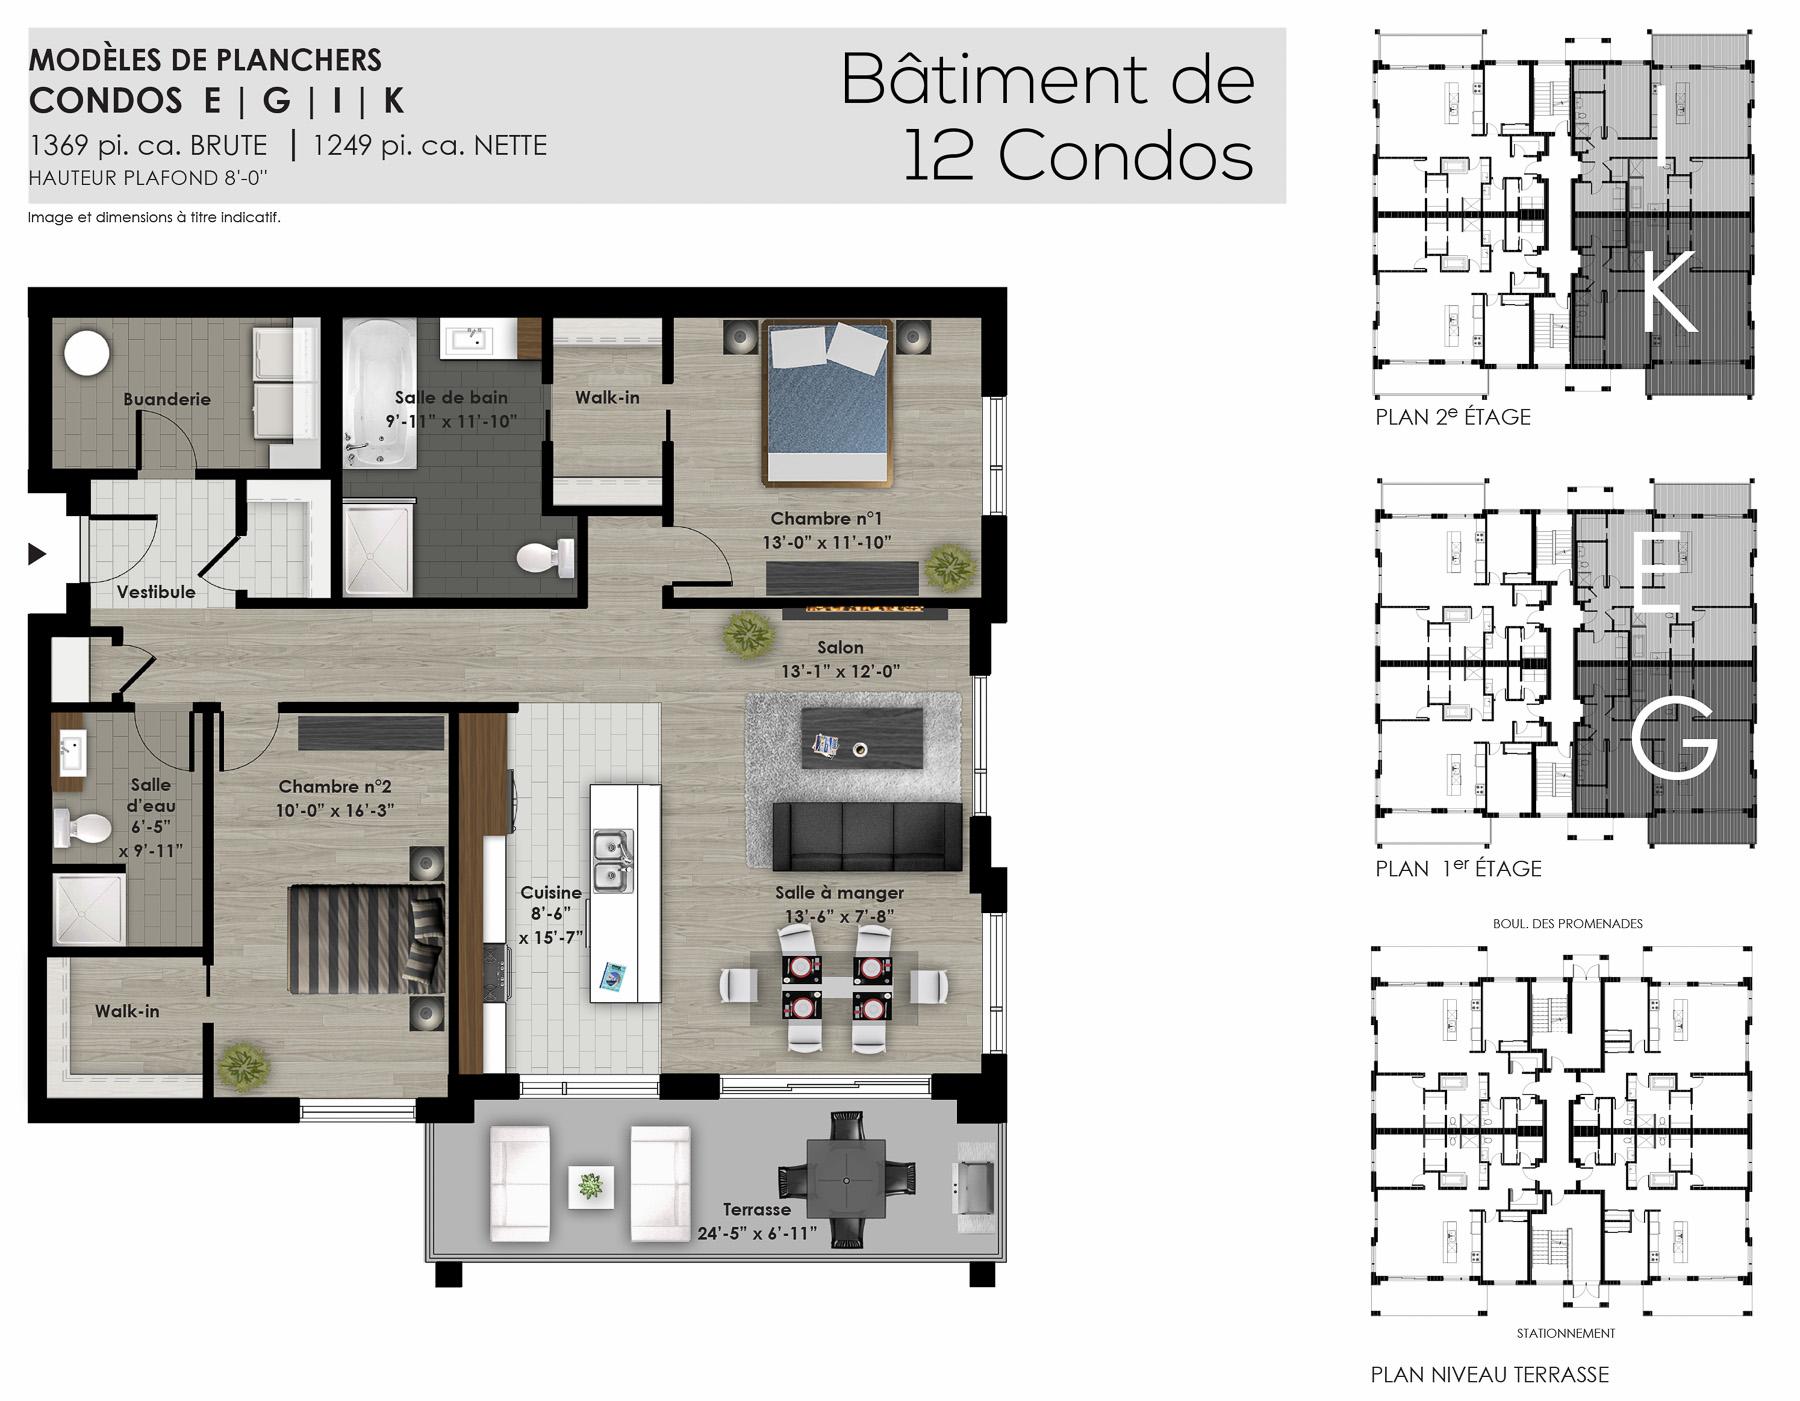 Condos centrocit 12 unit s condo neuf gbd construction for Condo plans with garage